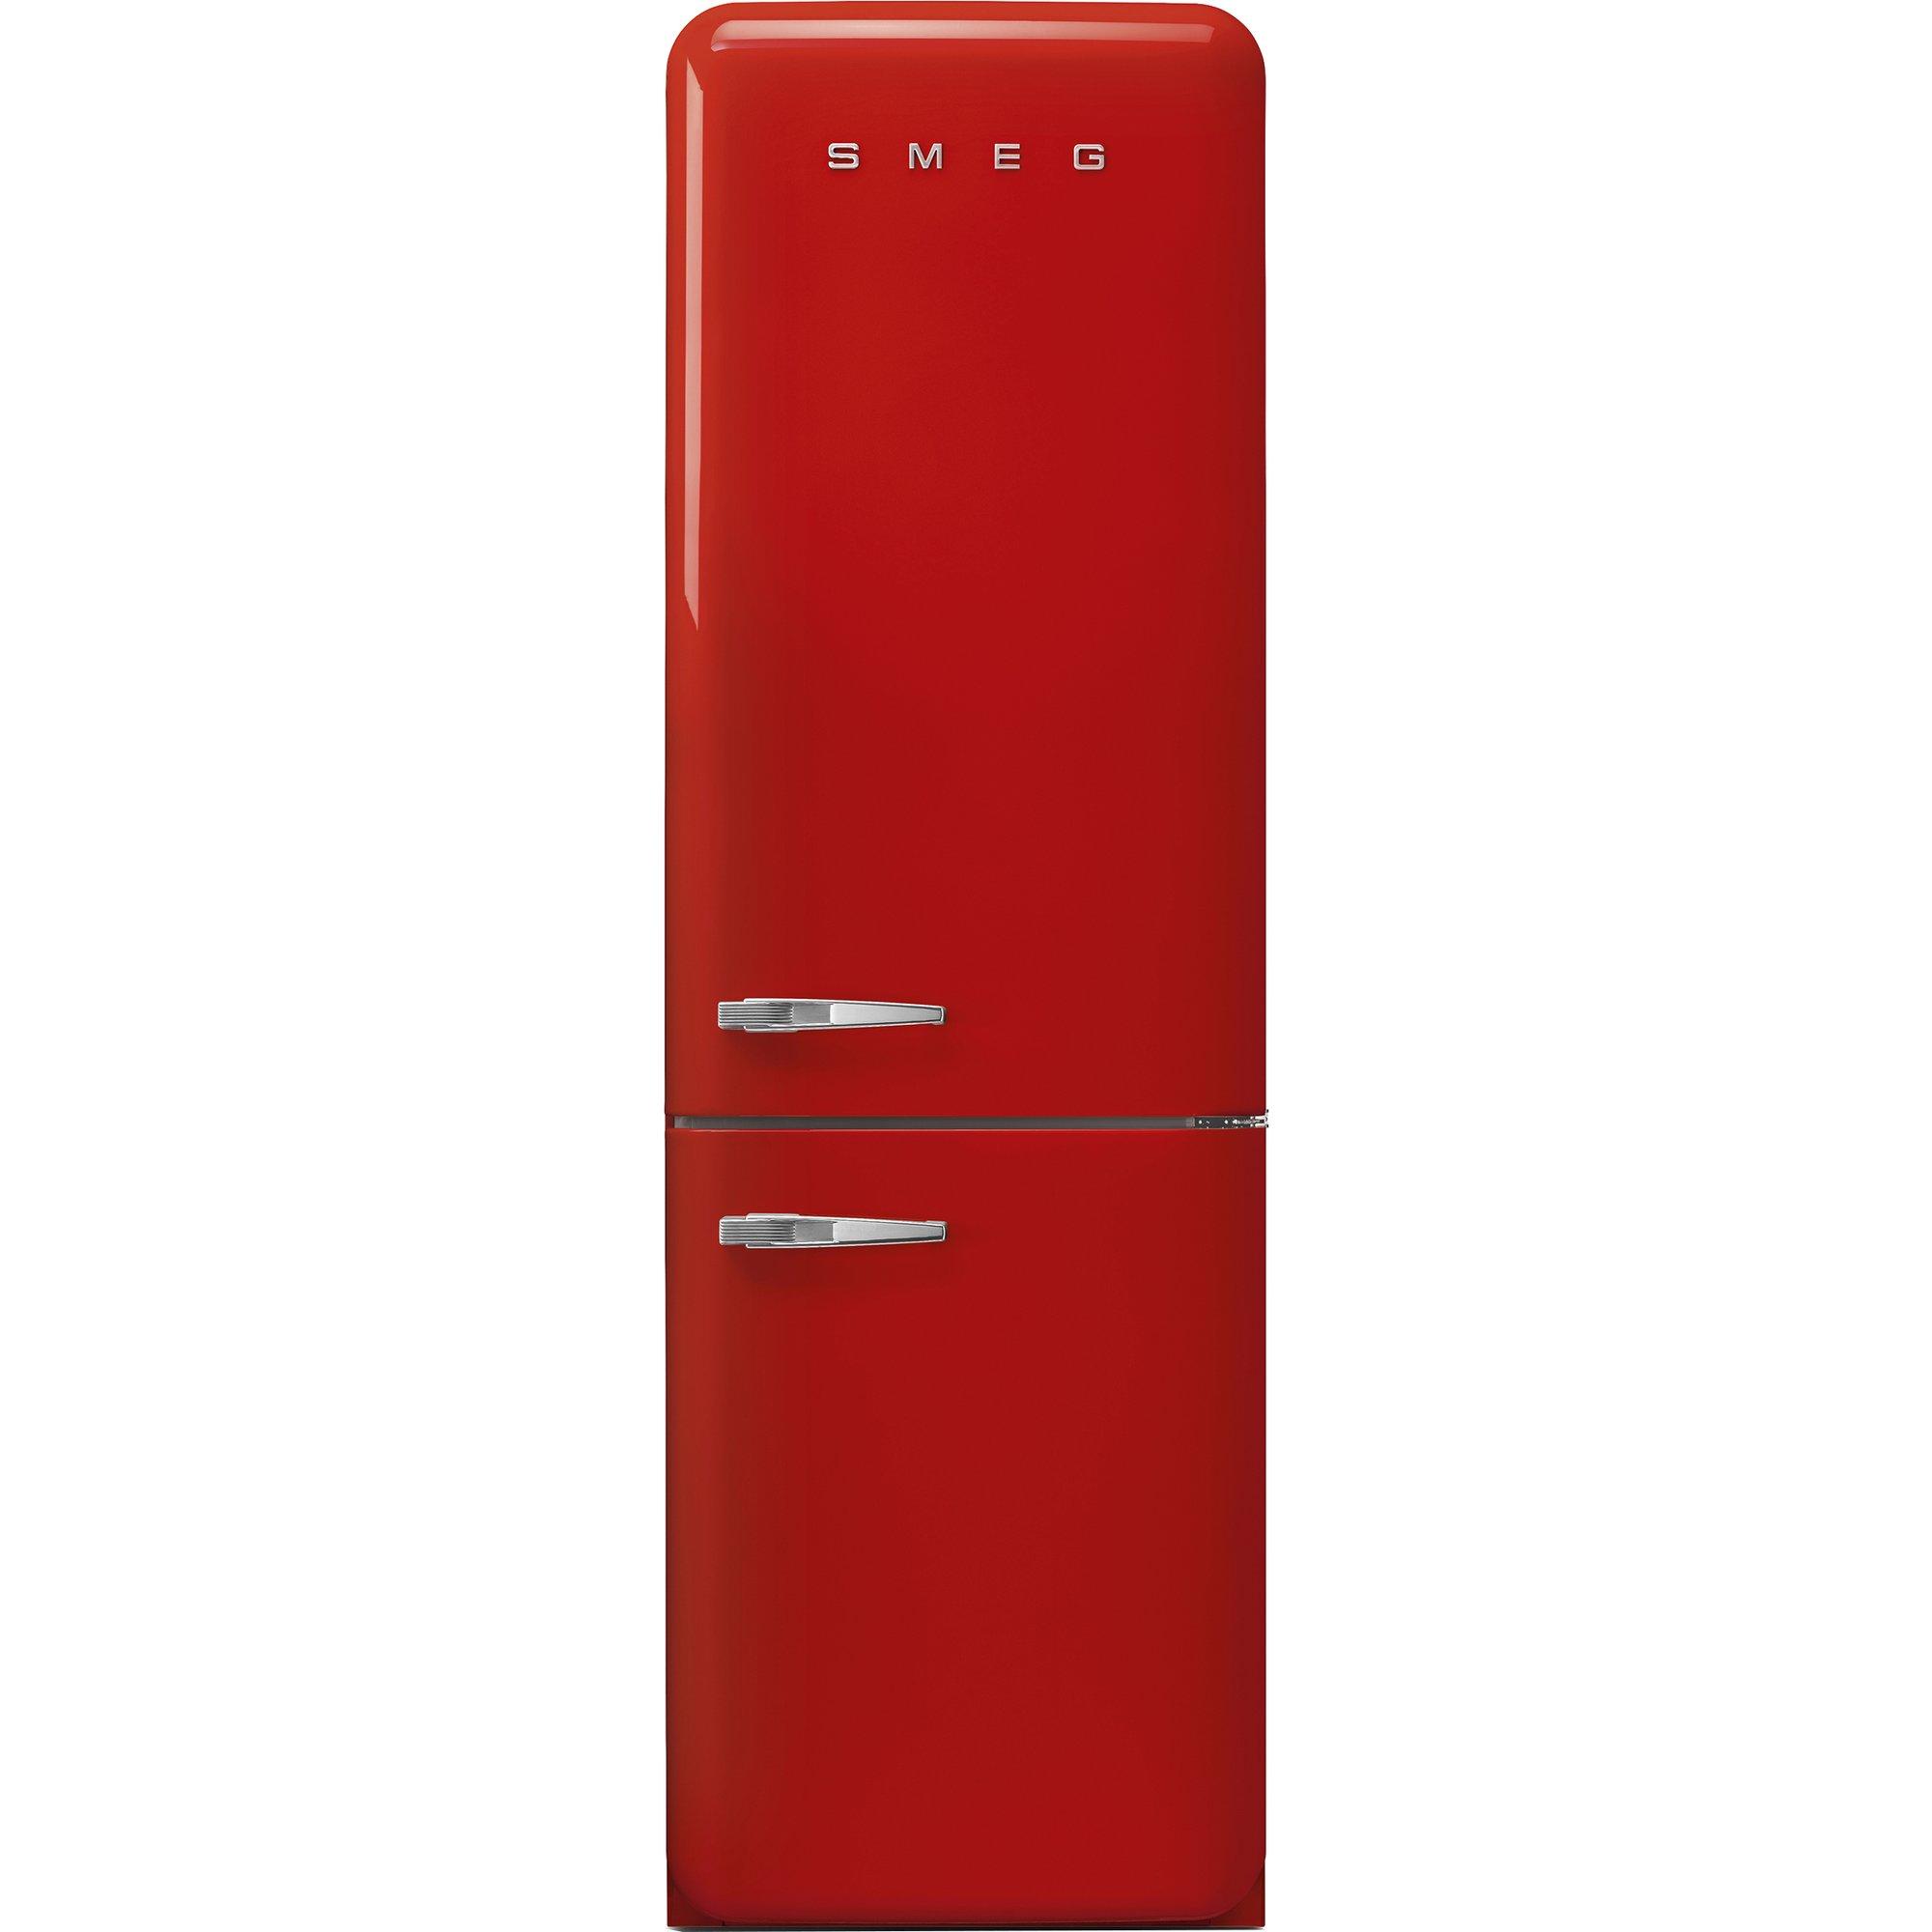 Smeg Kylskåp/frys i 50-tals retrostil högerhängt röd